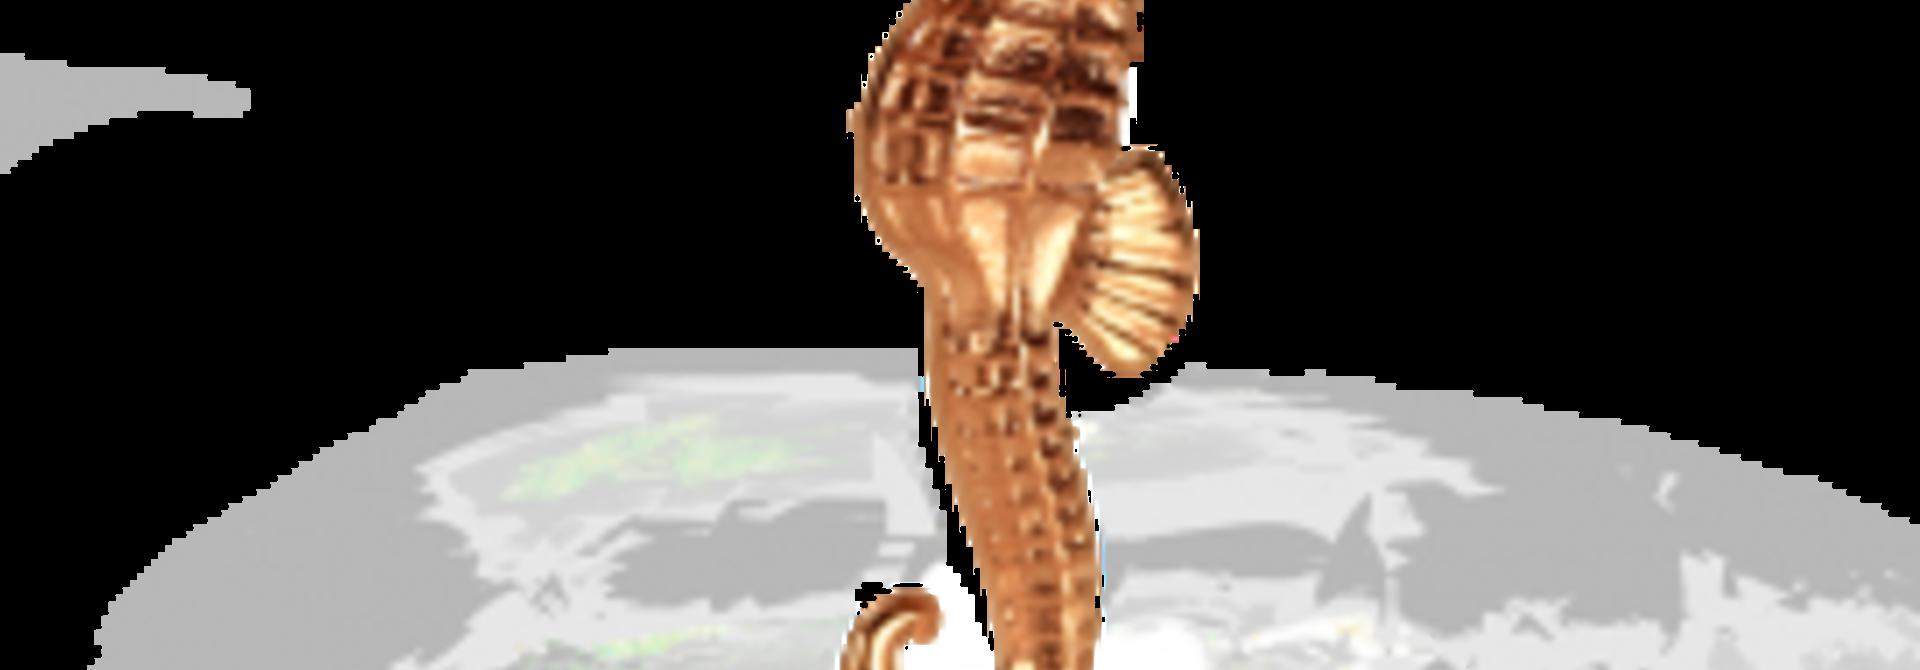 Seahorse Roze